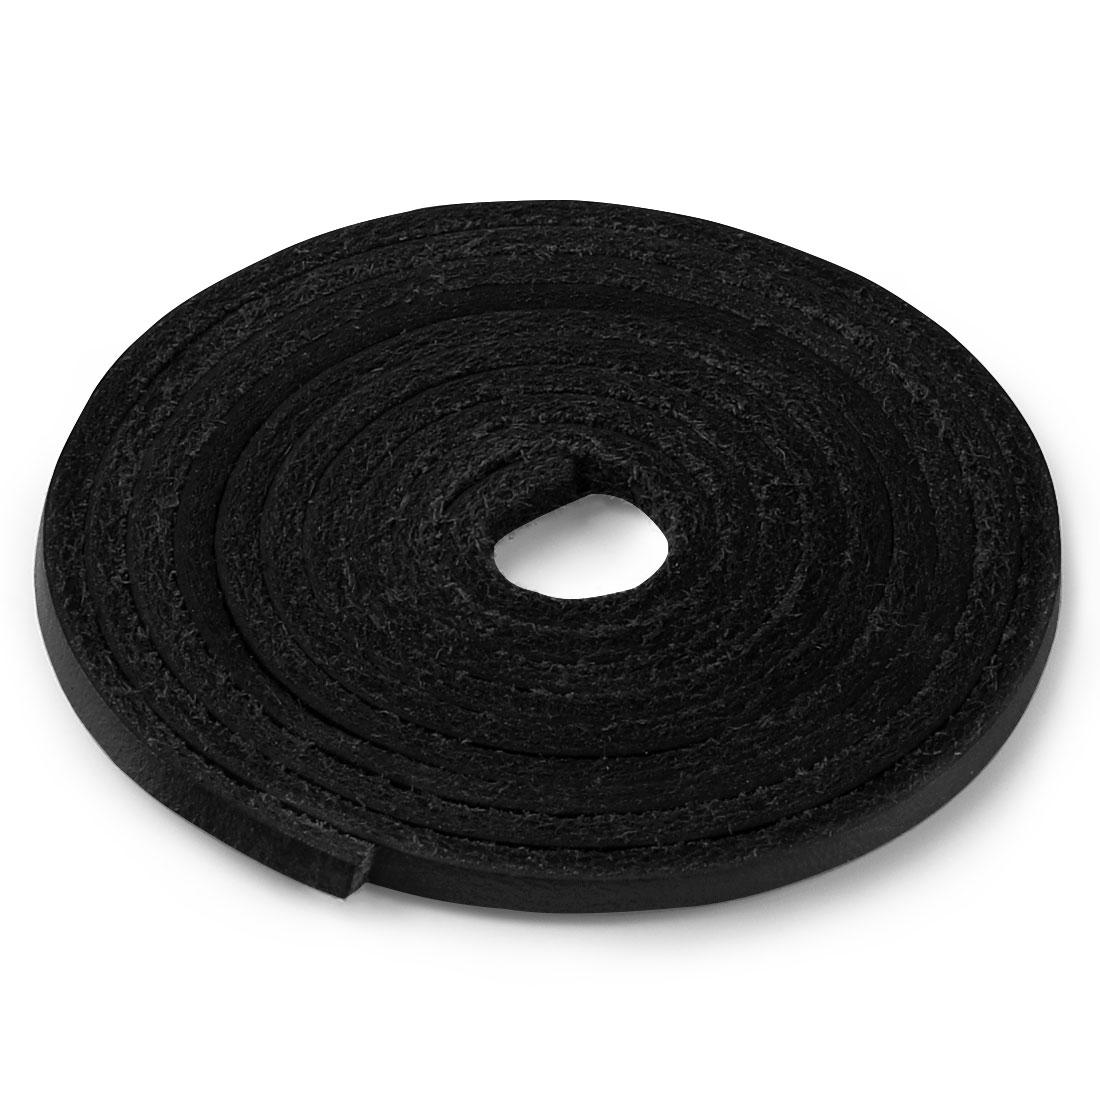 "Leather Boot Shoelaces for Boat Shoes Shoe Laces Black 100cm / 39.37"""